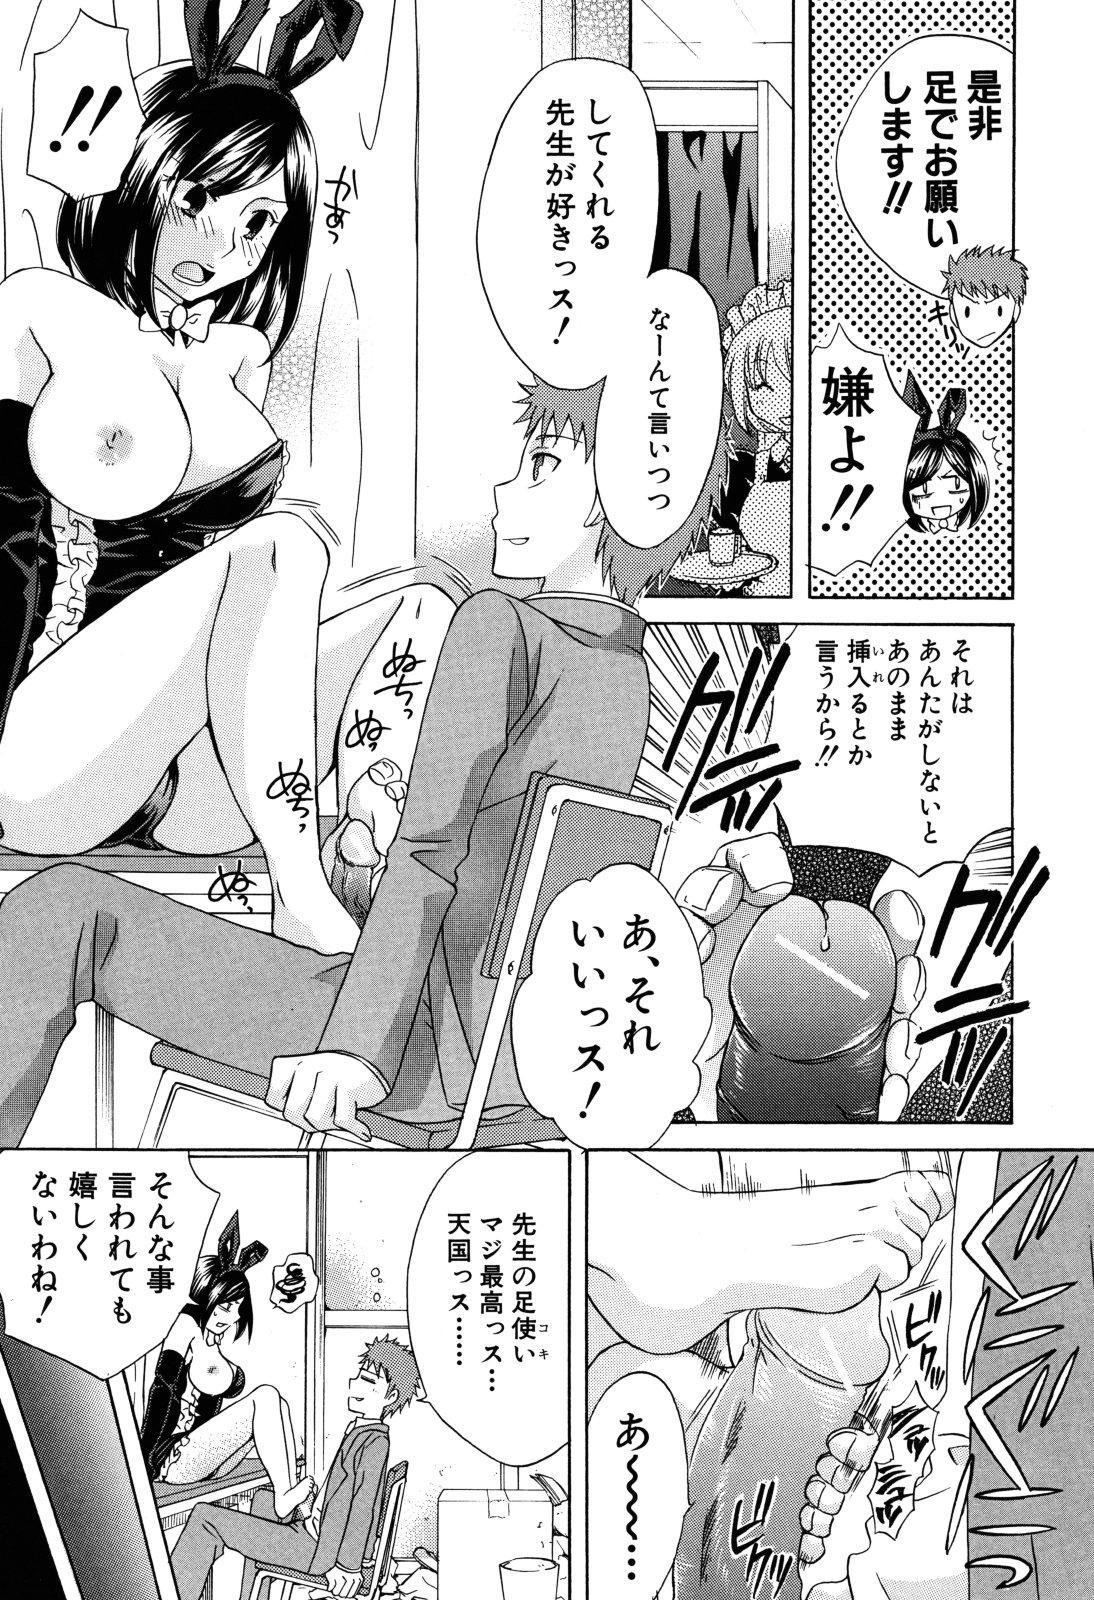 Kanojo ga Ochiru made - She in the depth 132